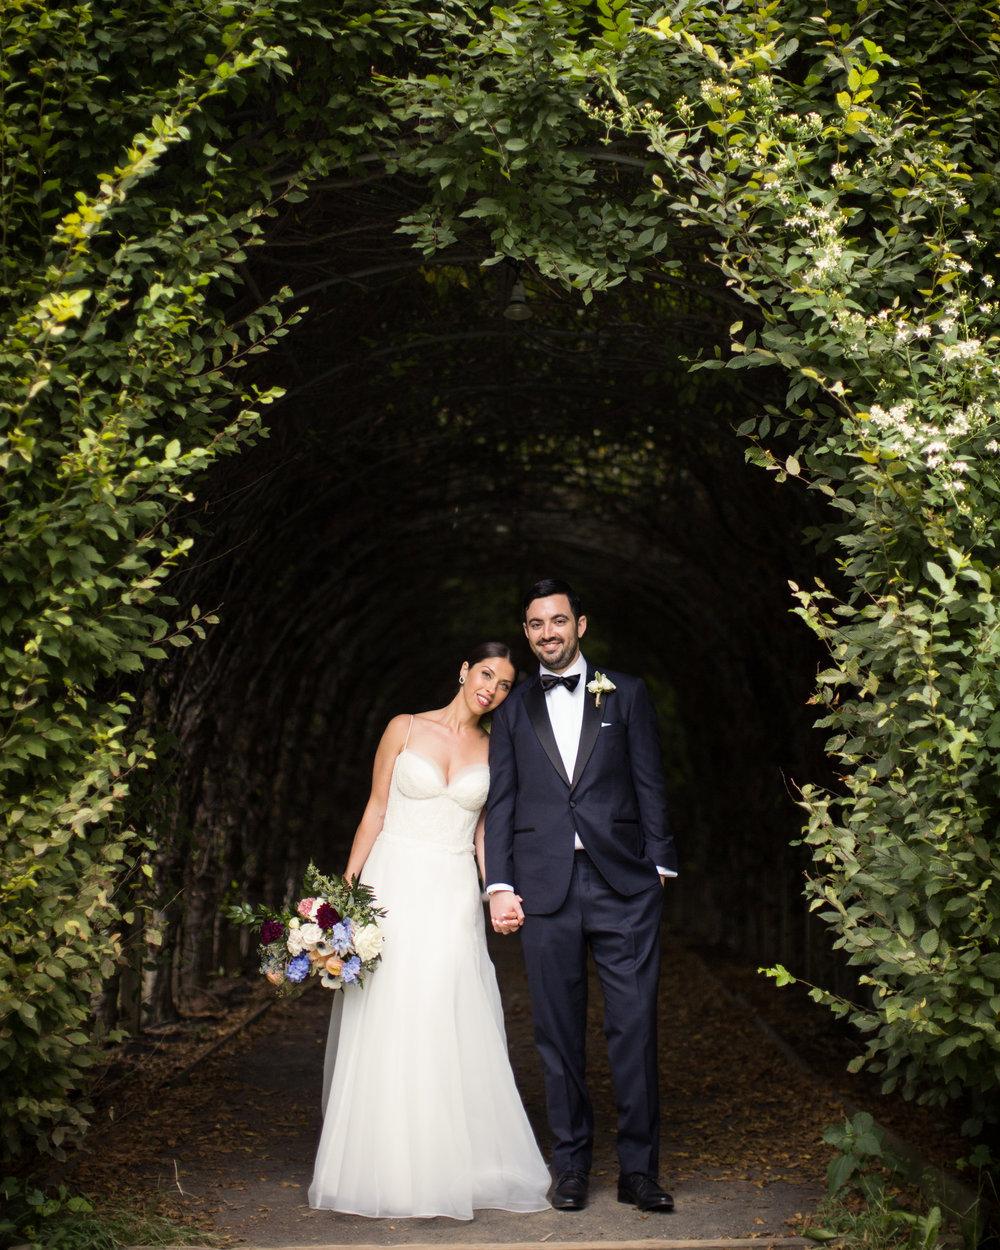 alex_edge_wedding_snug_harbor_ny_2.JPG